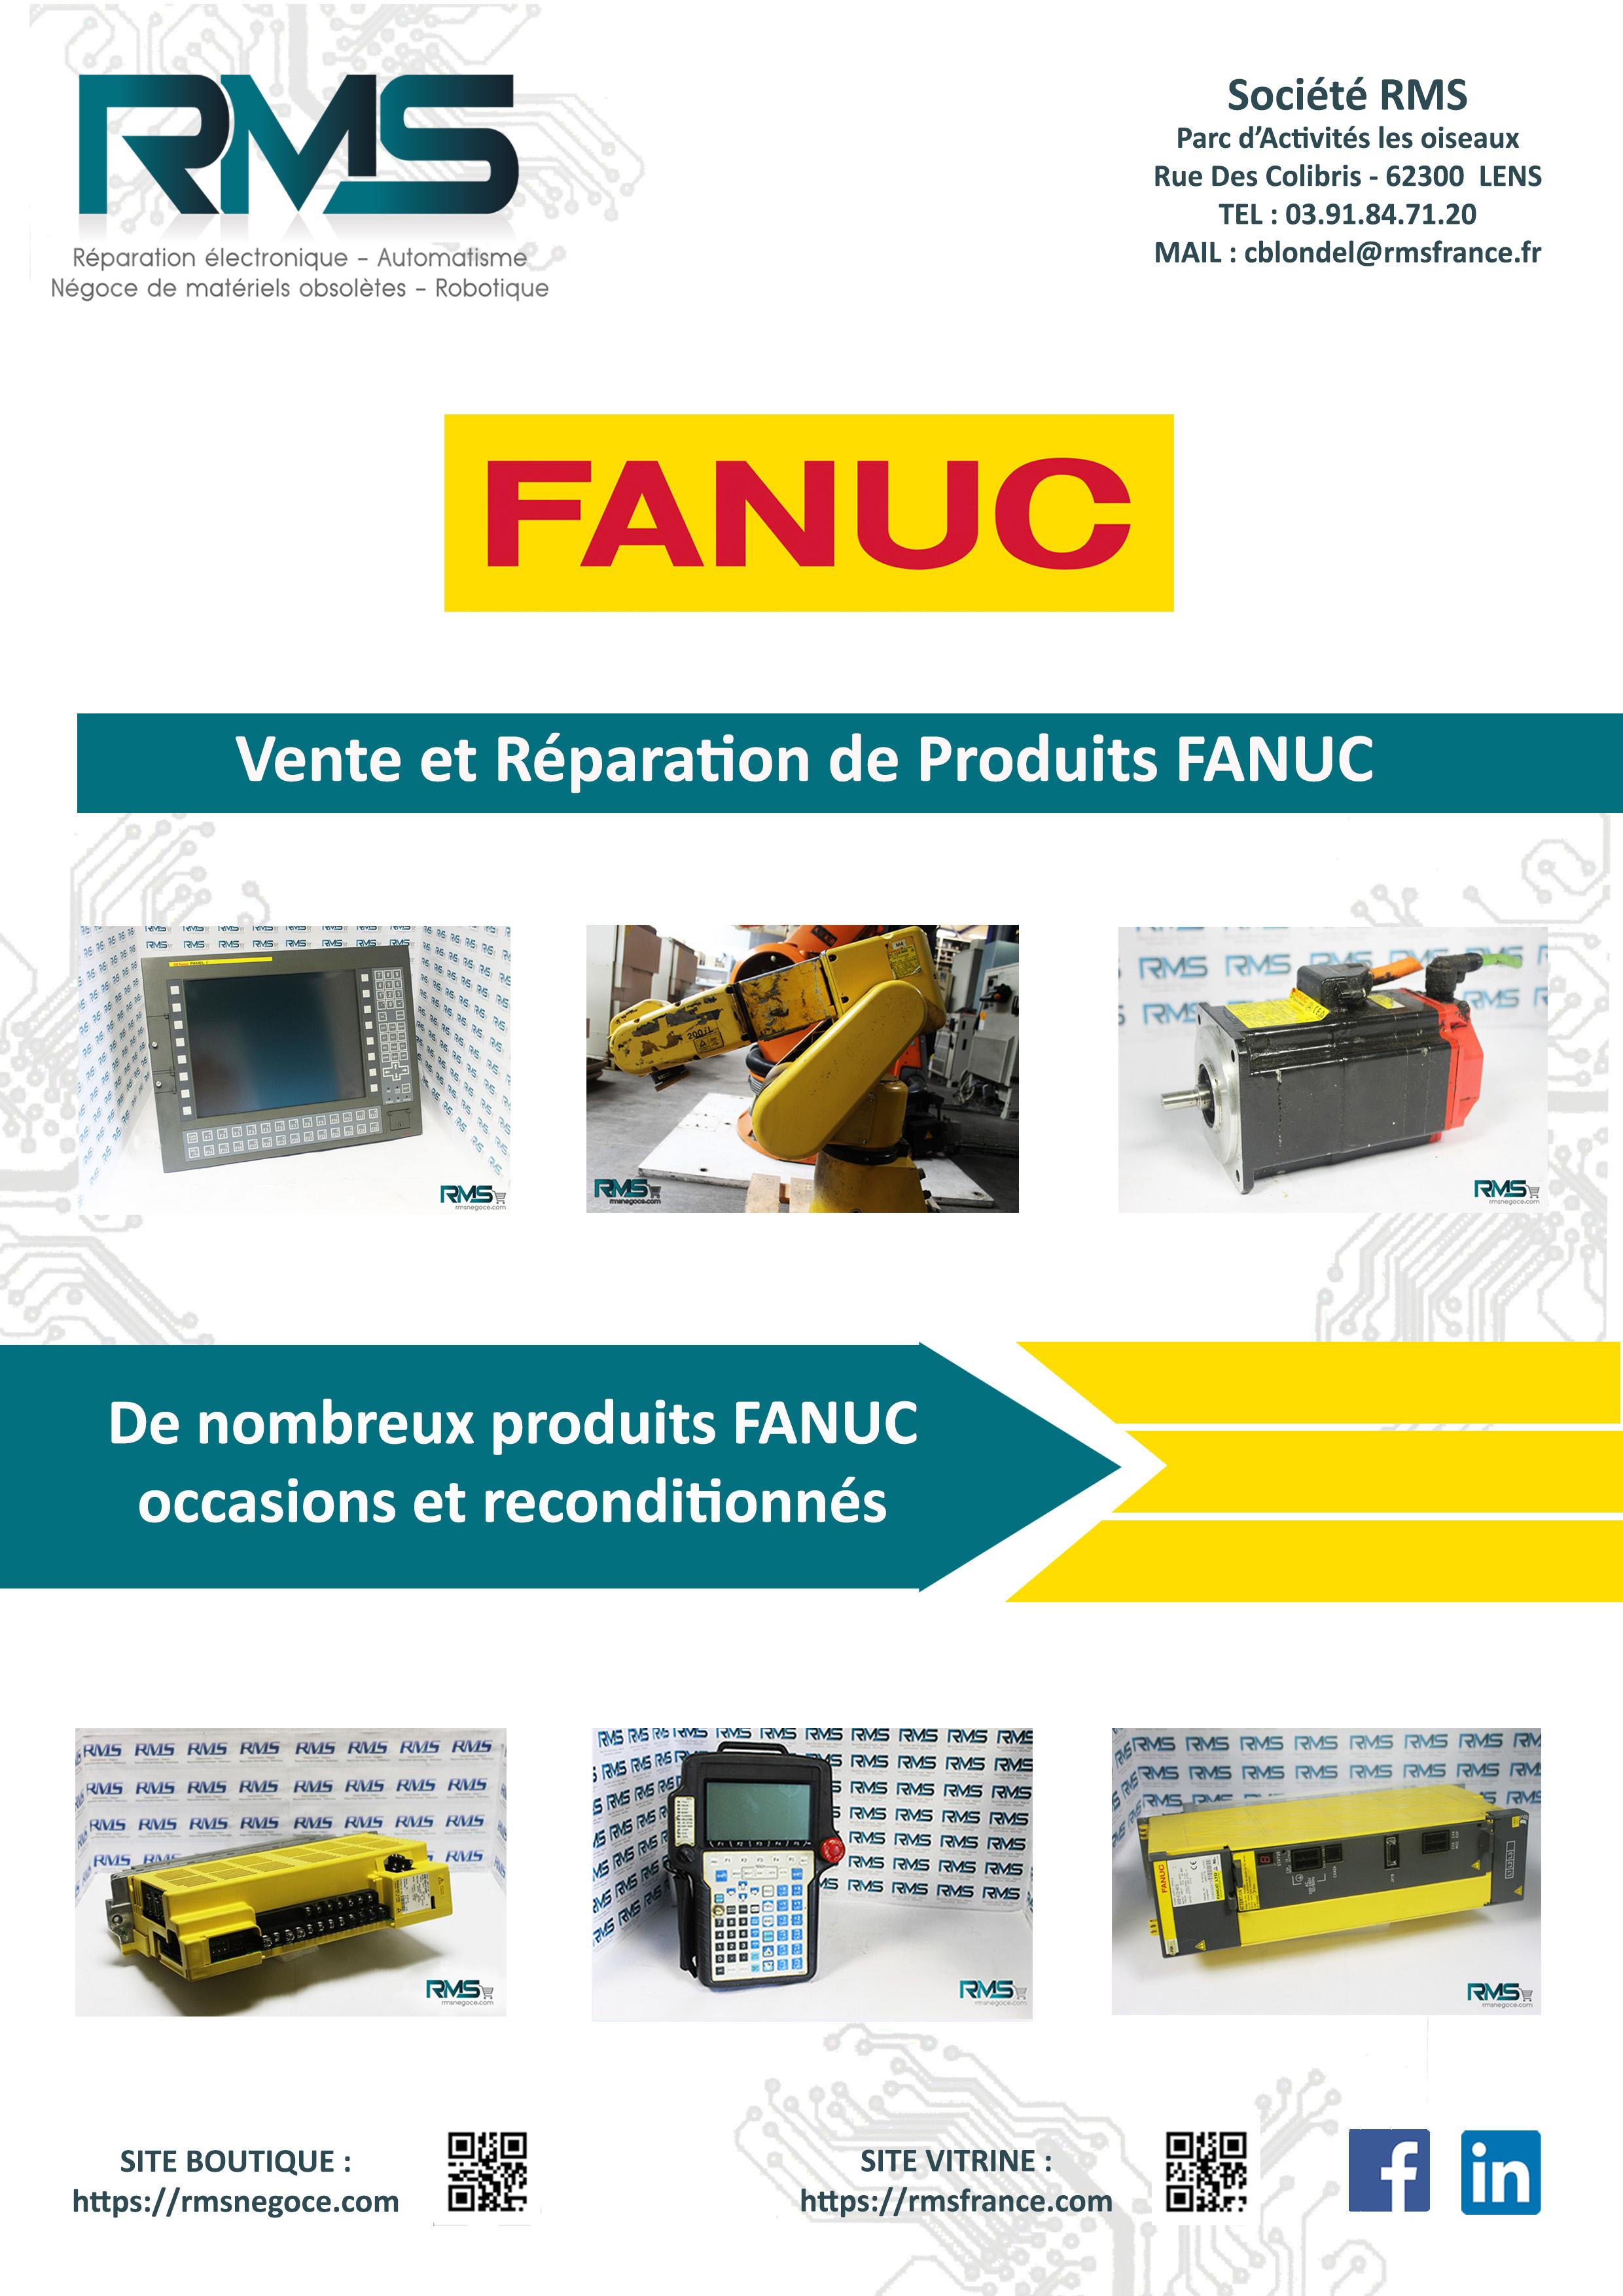 FANUC-ALIMENTATIONS FANUC-VARIATEUR FANUC - RMSNEGOCE